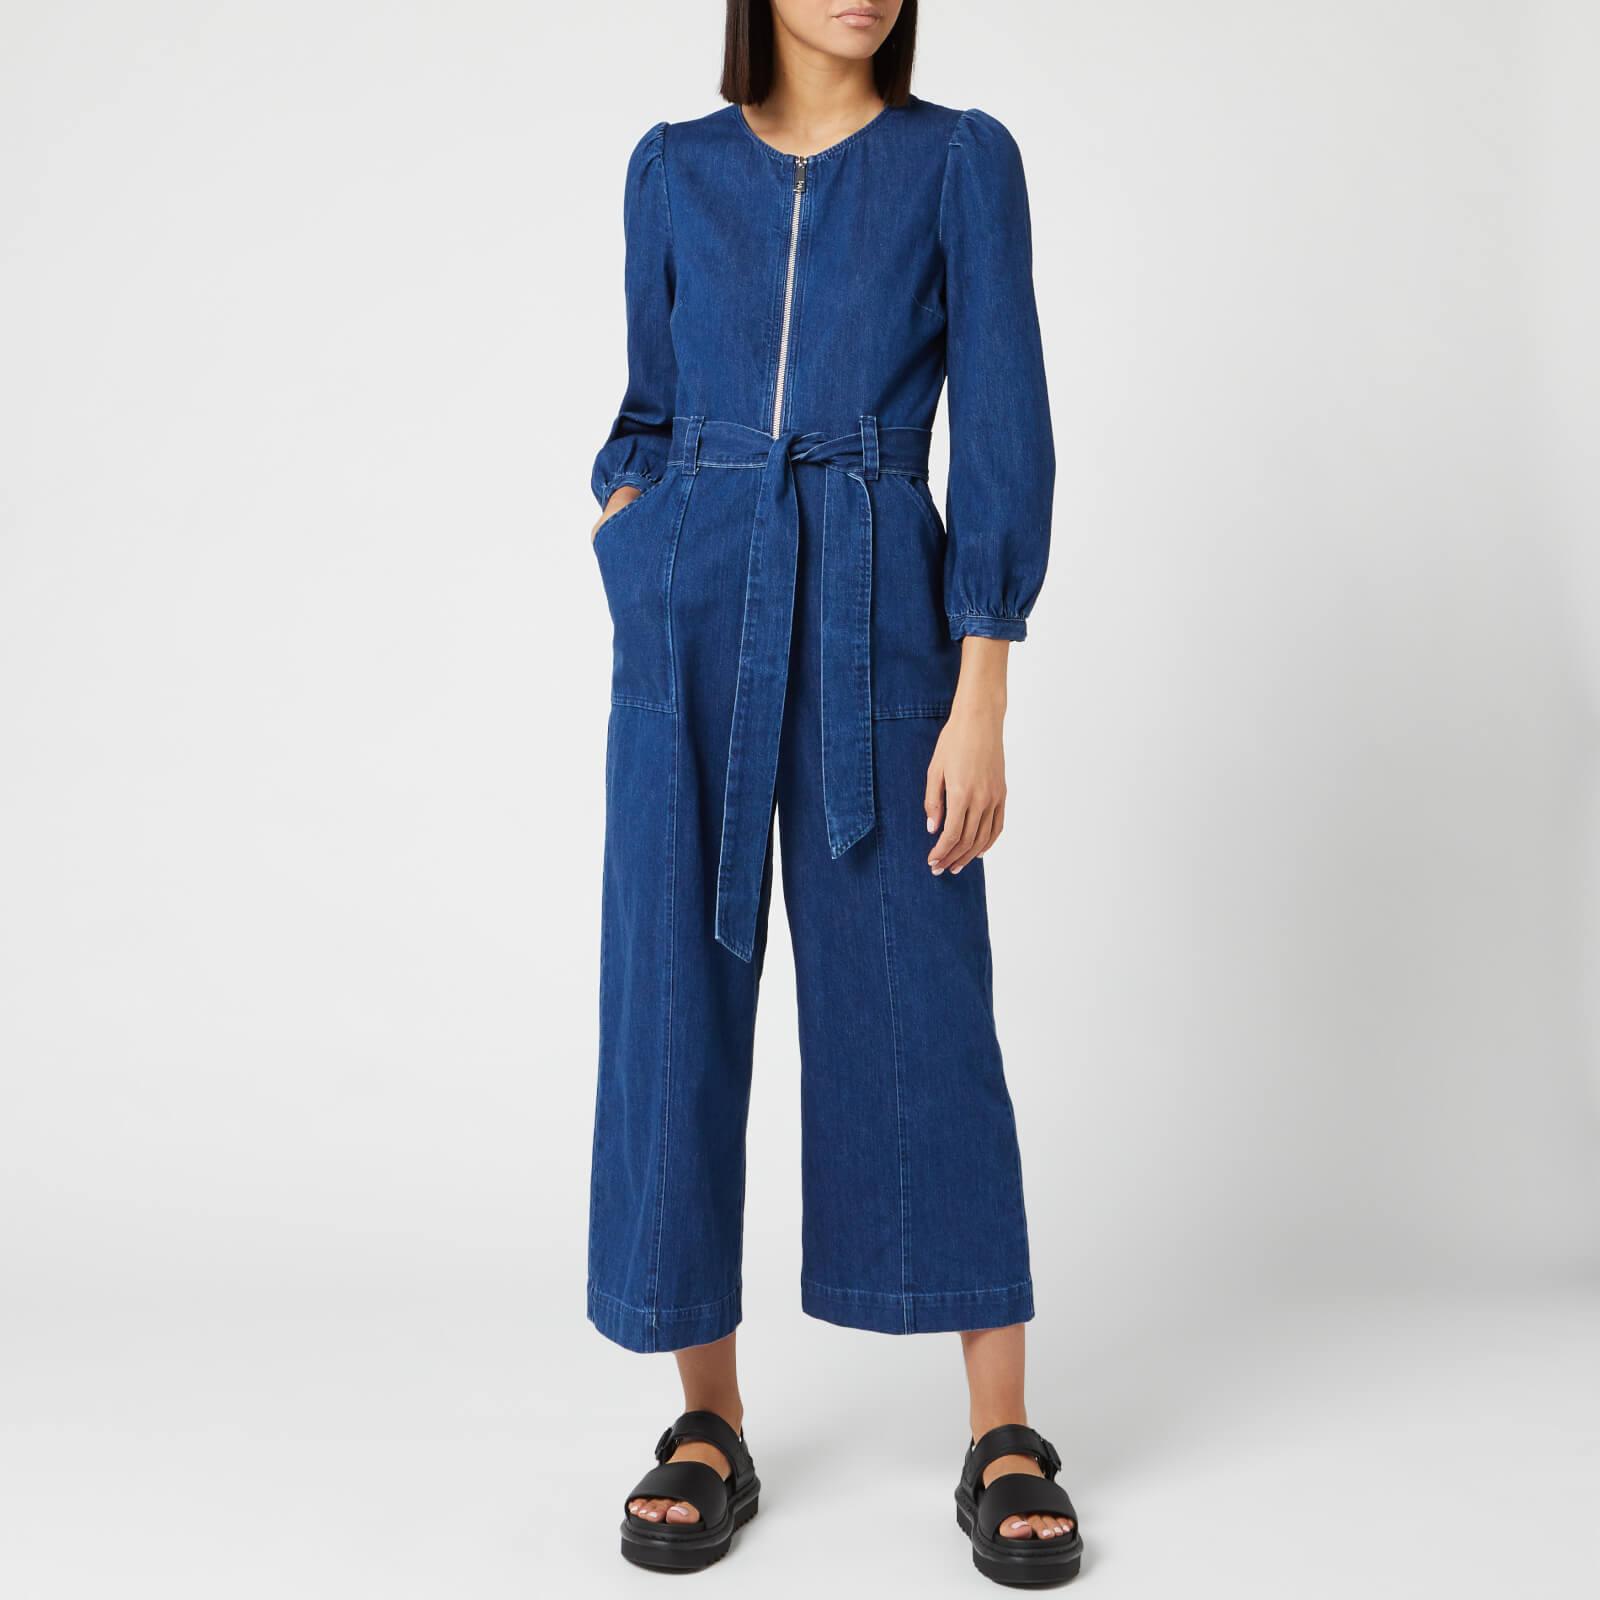 Whistles Women's Estelle Denim Jumpsuit - Blue - UK 16